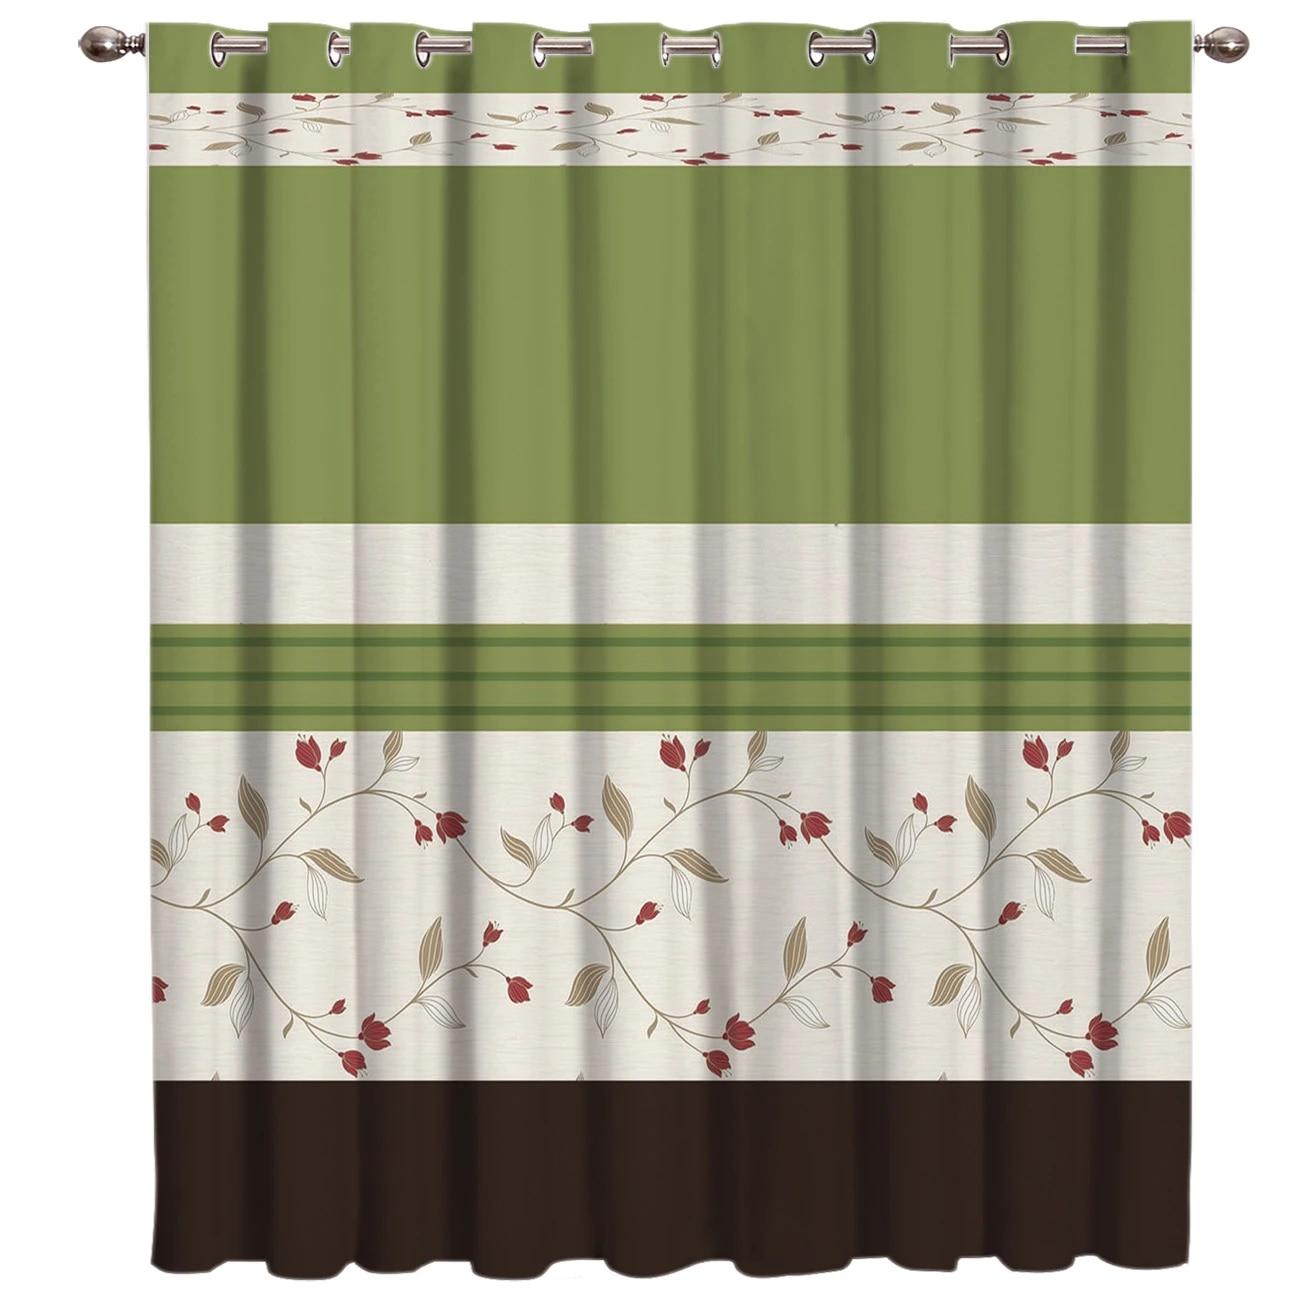 vintage flower green window curtains dark curtains bedroom indoor decor kids curtain panels with grommets window treatment ideas